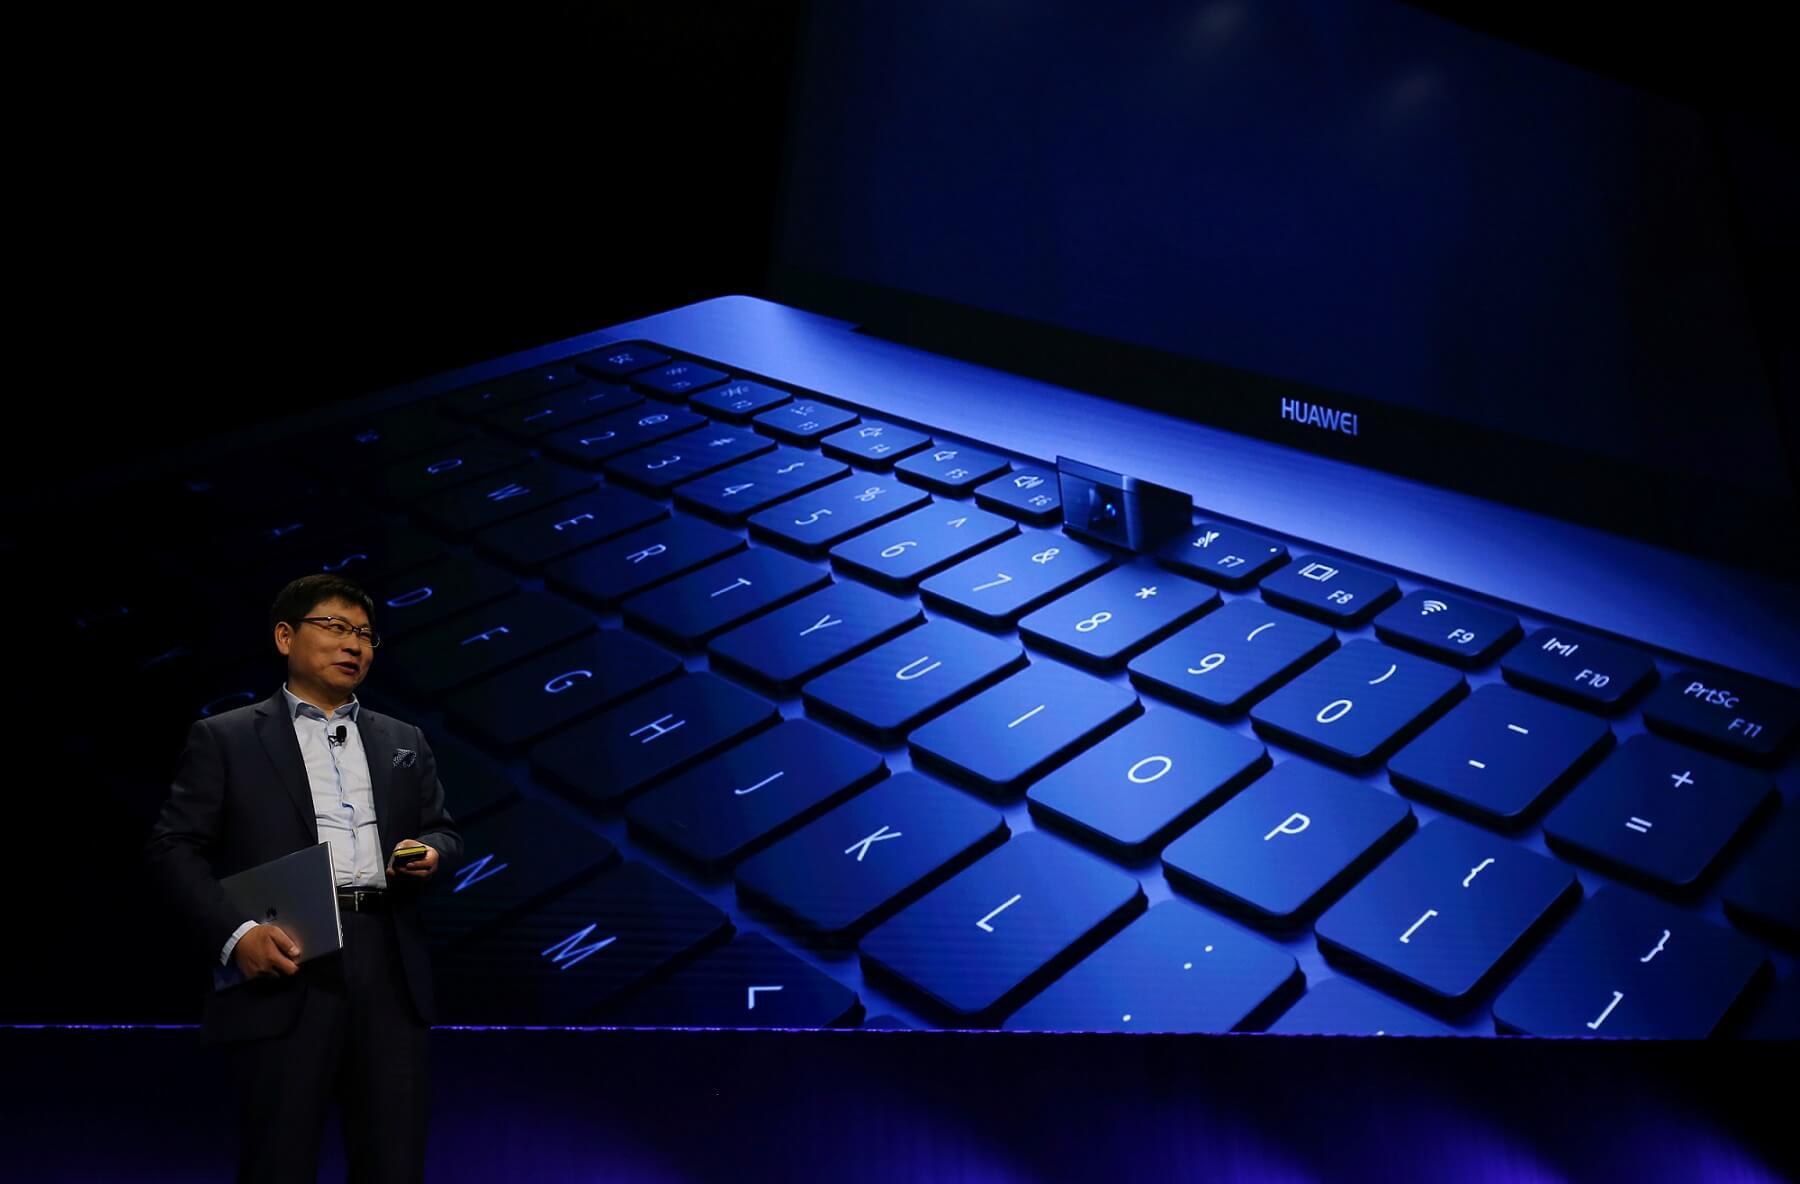 Mobile World Congress, Huawei, laptop